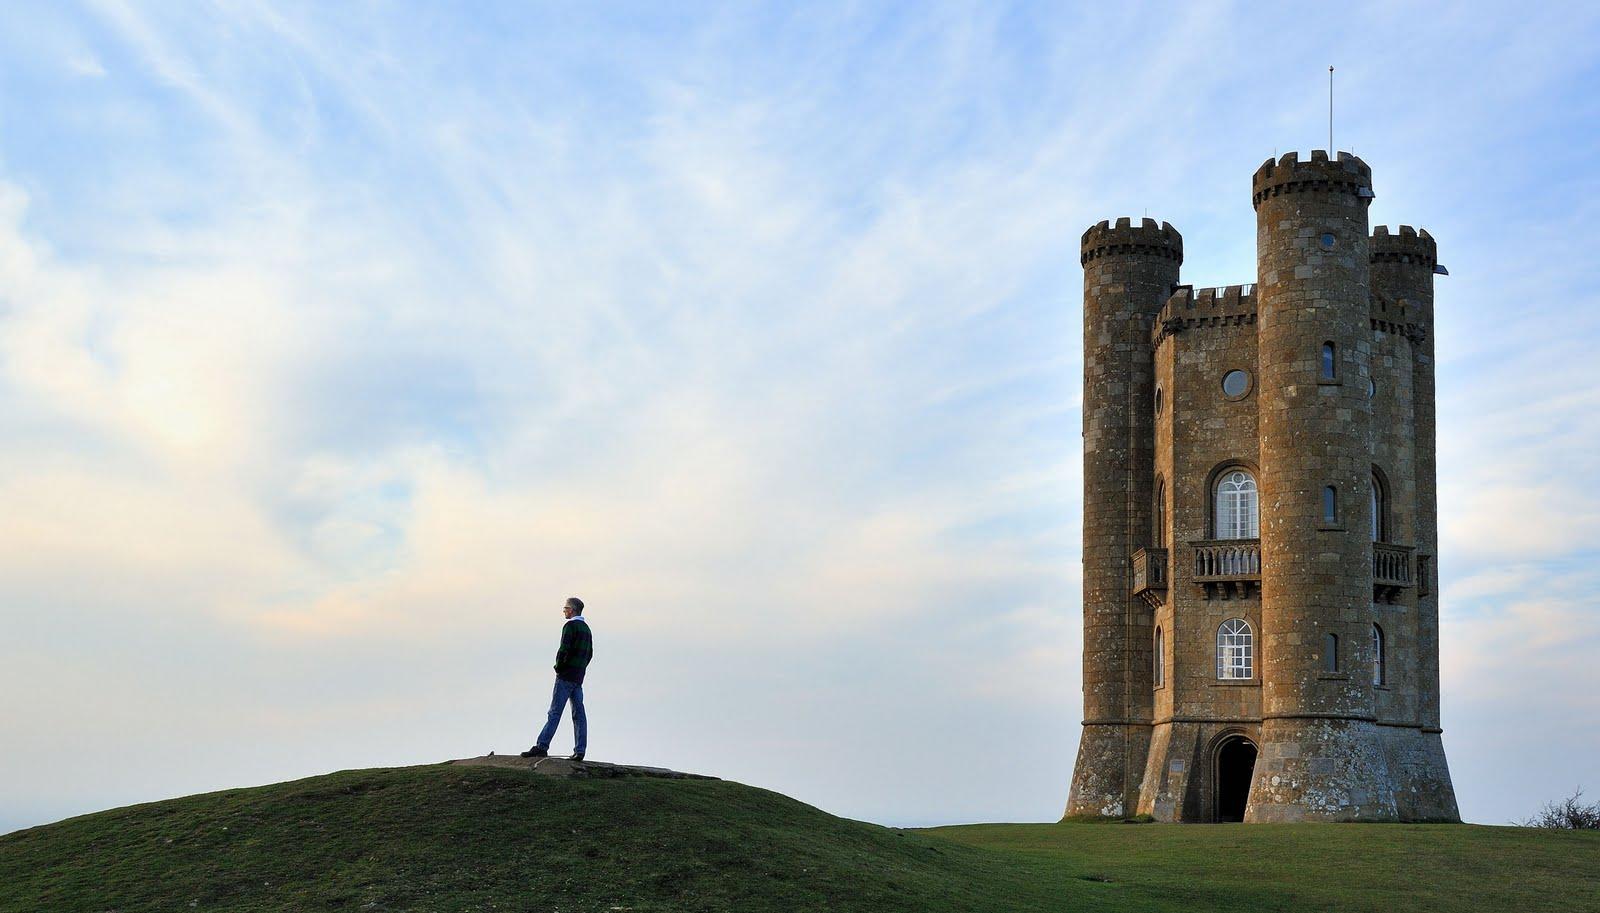 broadway tower - photo #15